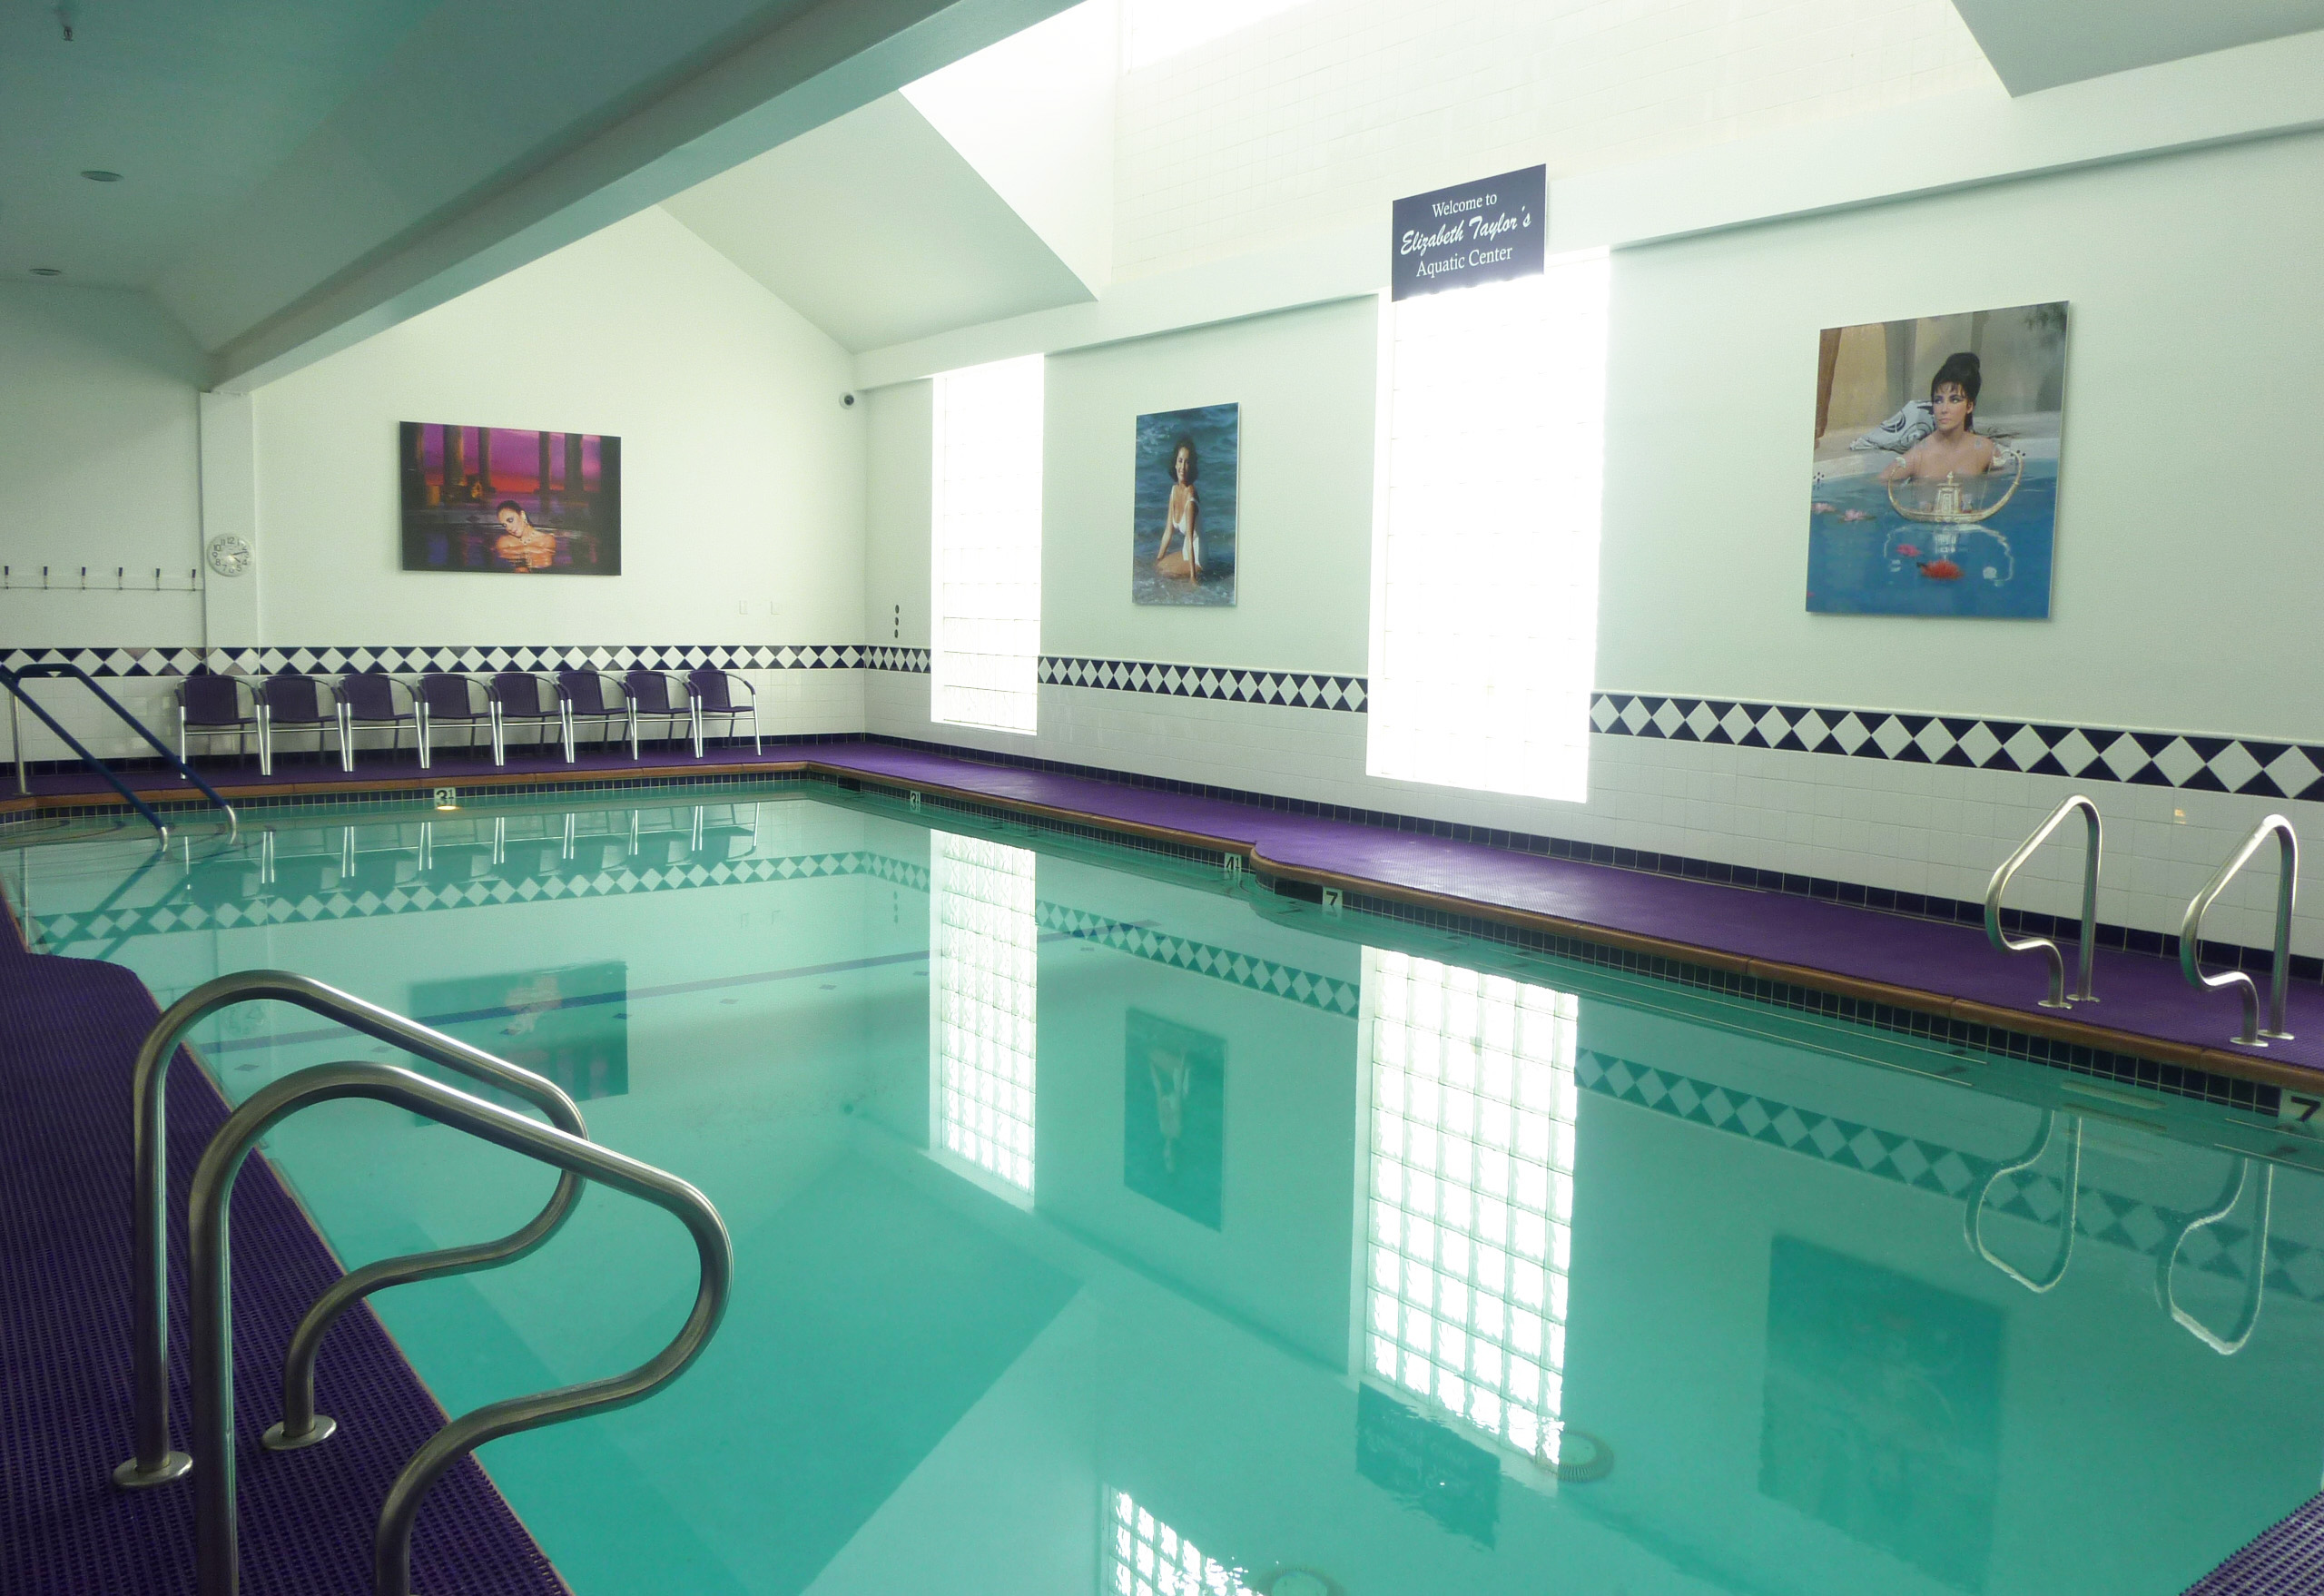 Introducing Elizabeth Taylor S Aquatic Center